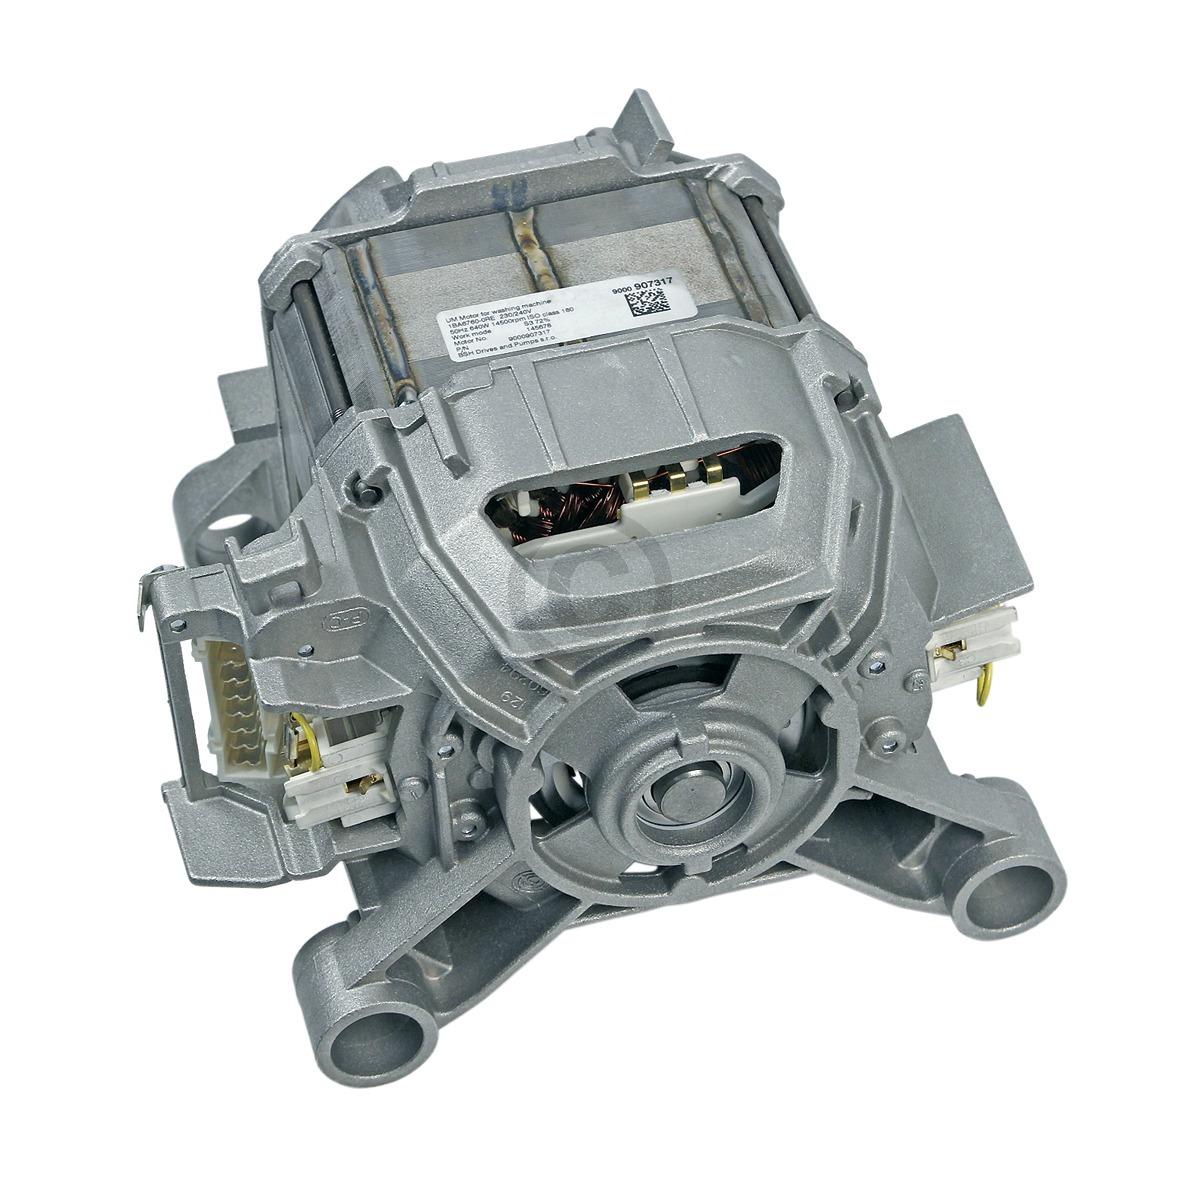 Motor, 7 Anschlüsse 00145678 145678 Bosch, Siemens, Neff